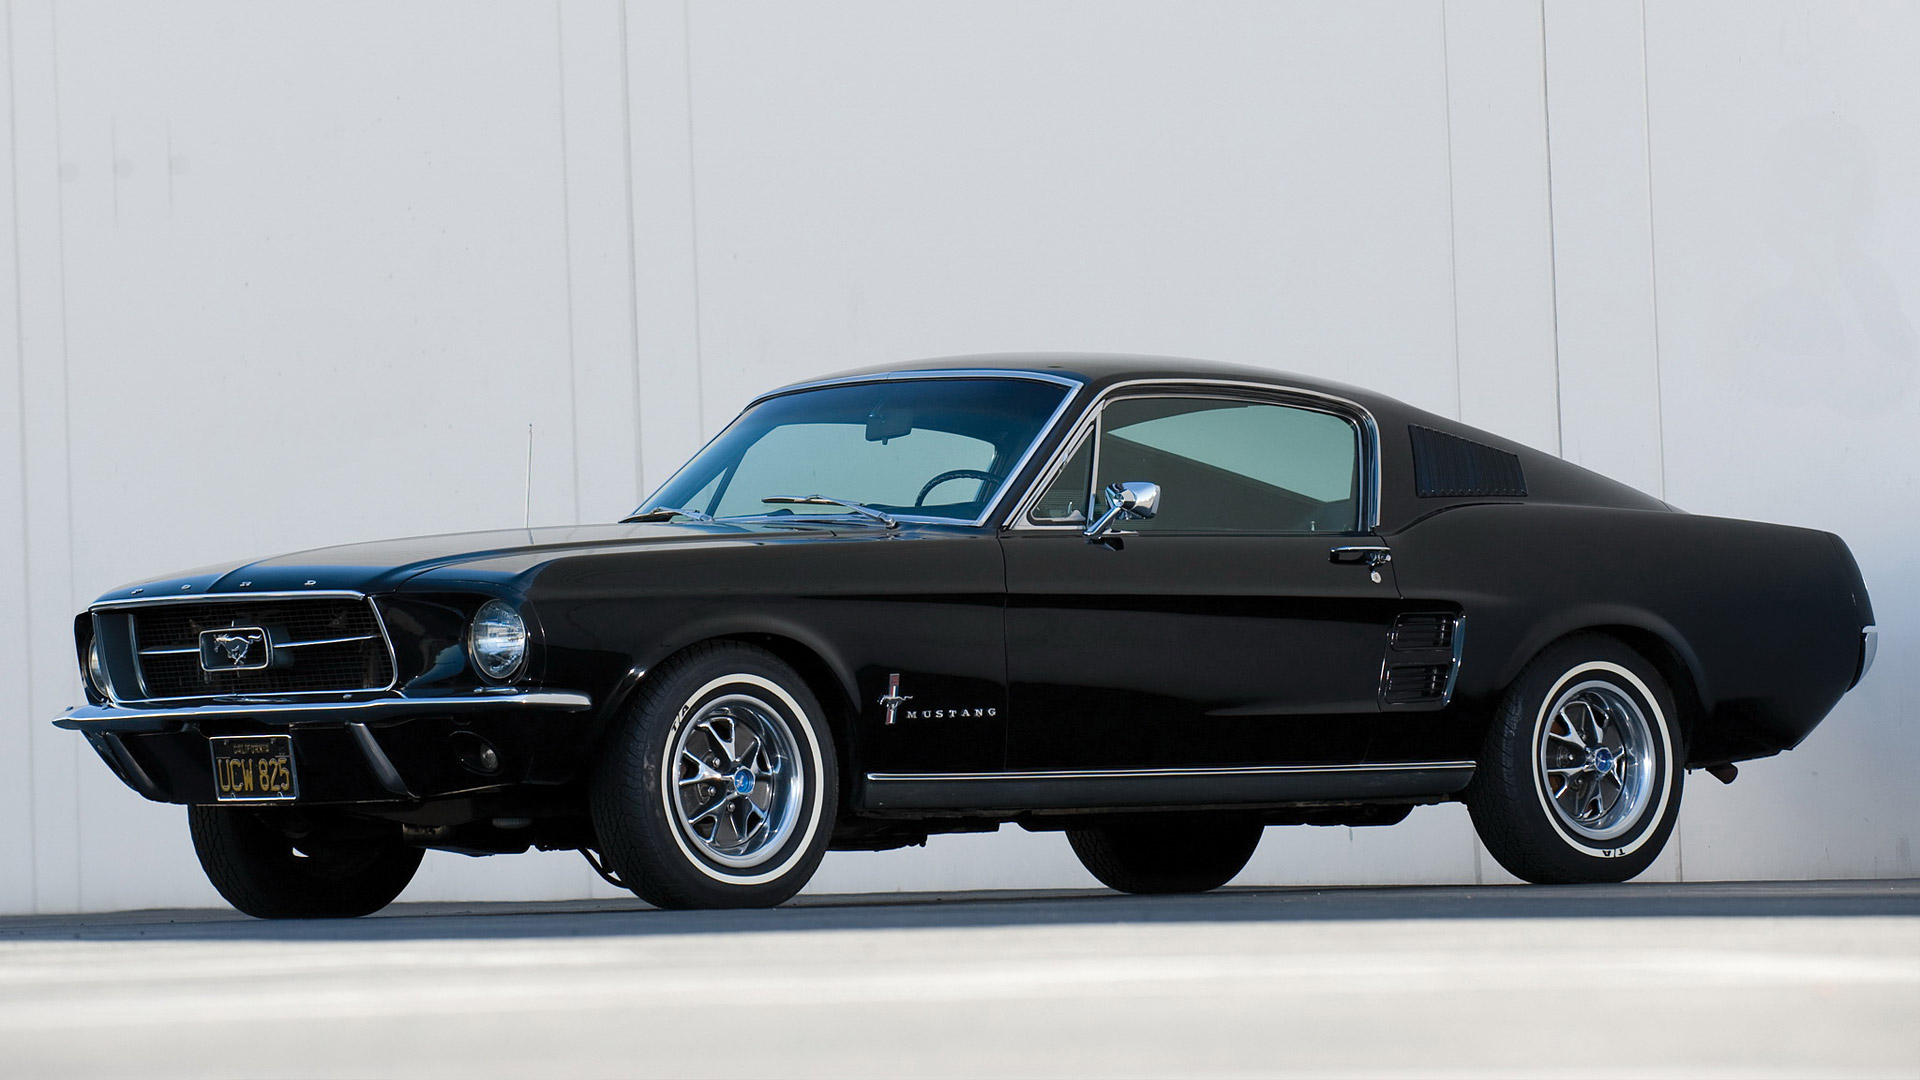 30 Mustang Fastback Wallpapers On Wallpapersafari